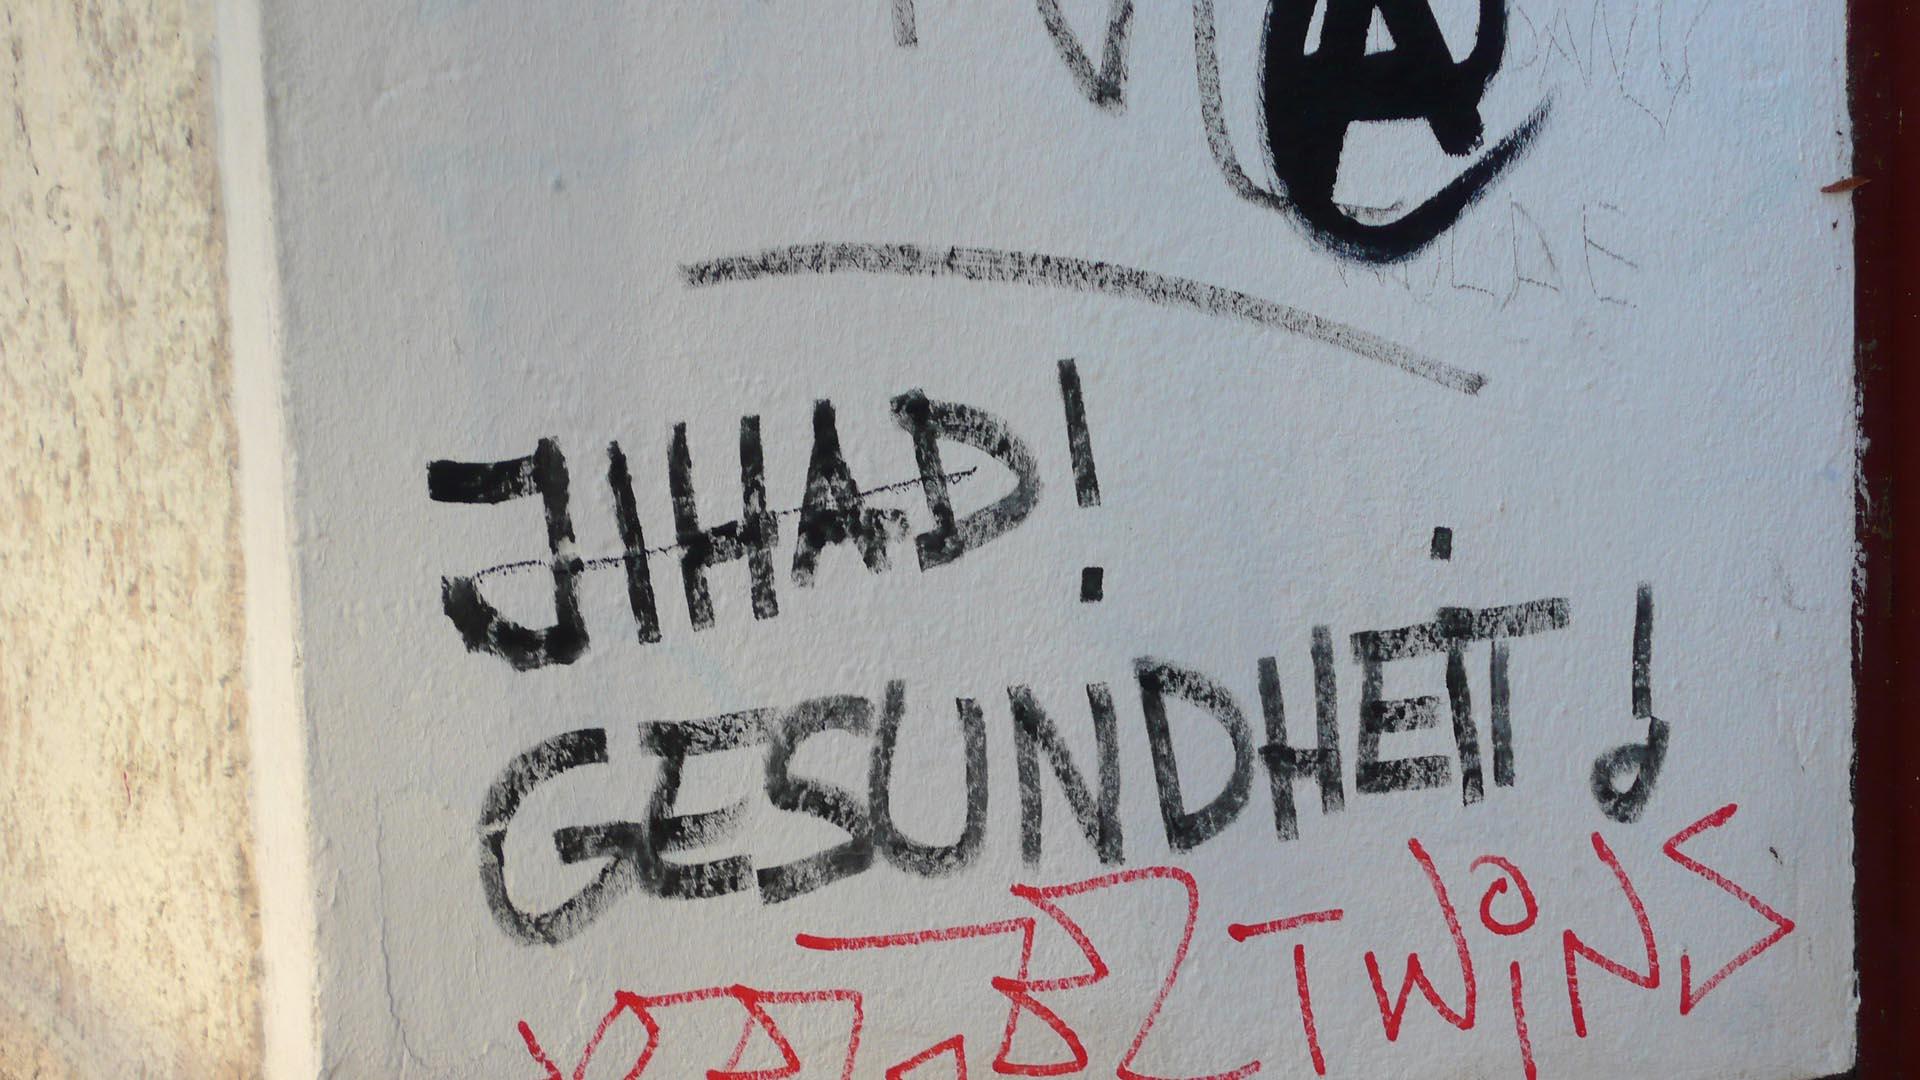 Graffiti, Street, Urban, Botschaft, Berlin, Neukölln, Jihad